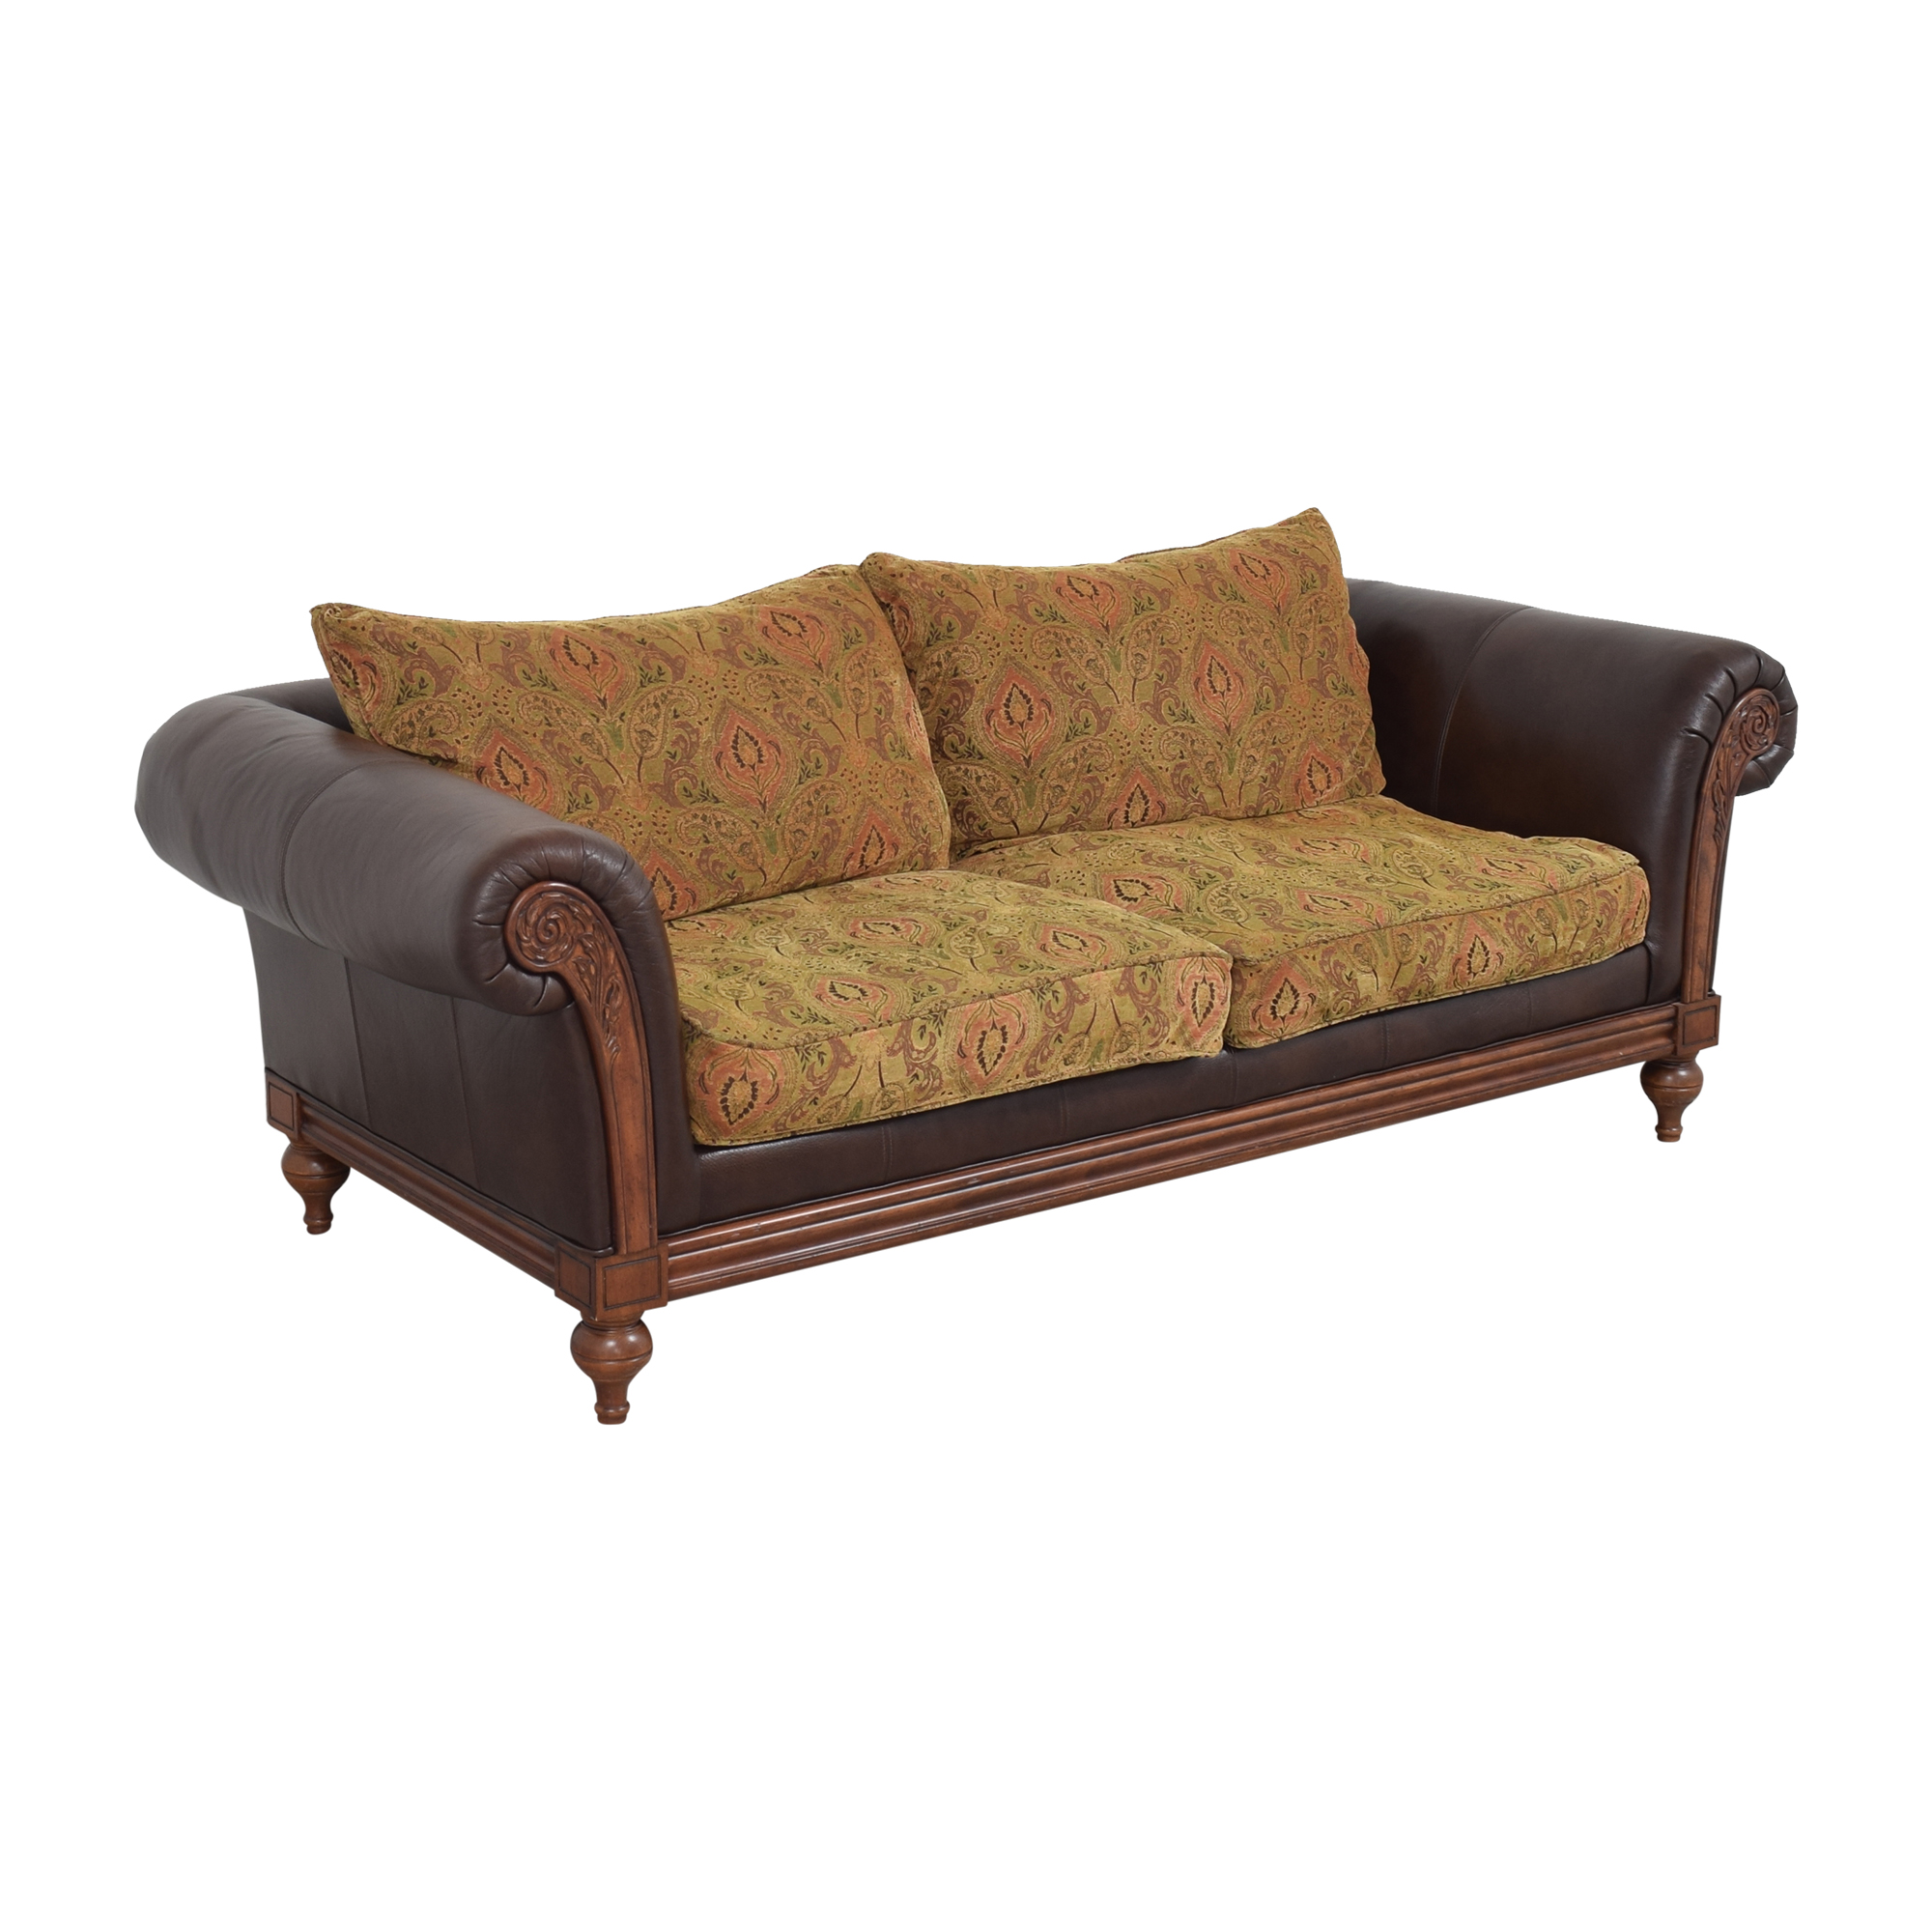 Ethan Allen Ethan Allen Pratt Sofa discount